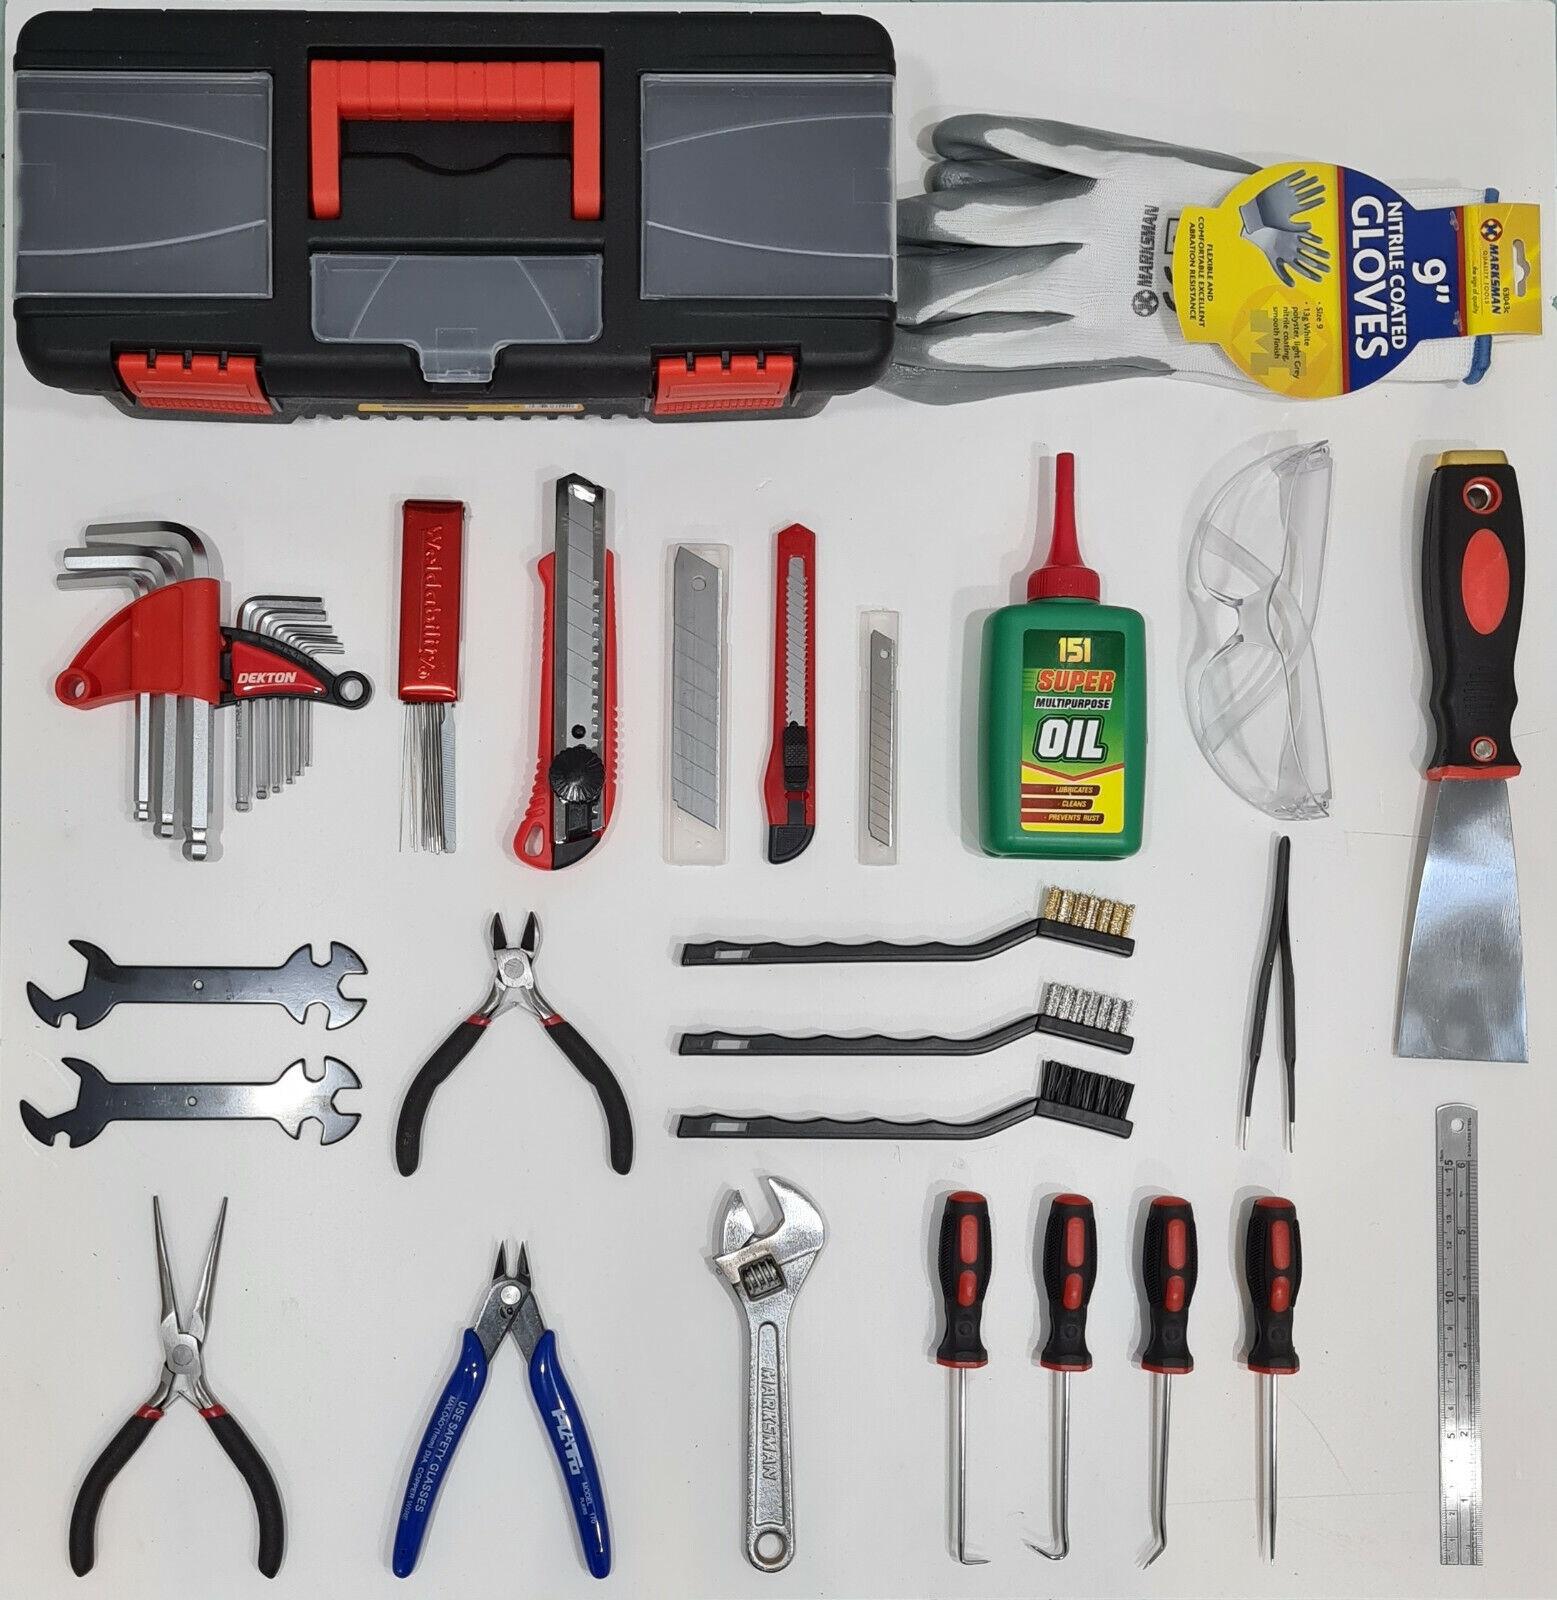 3D Printer FDM / FFF DIY Operation & Maintenance Toolkit & Safety PPE Set Bundle